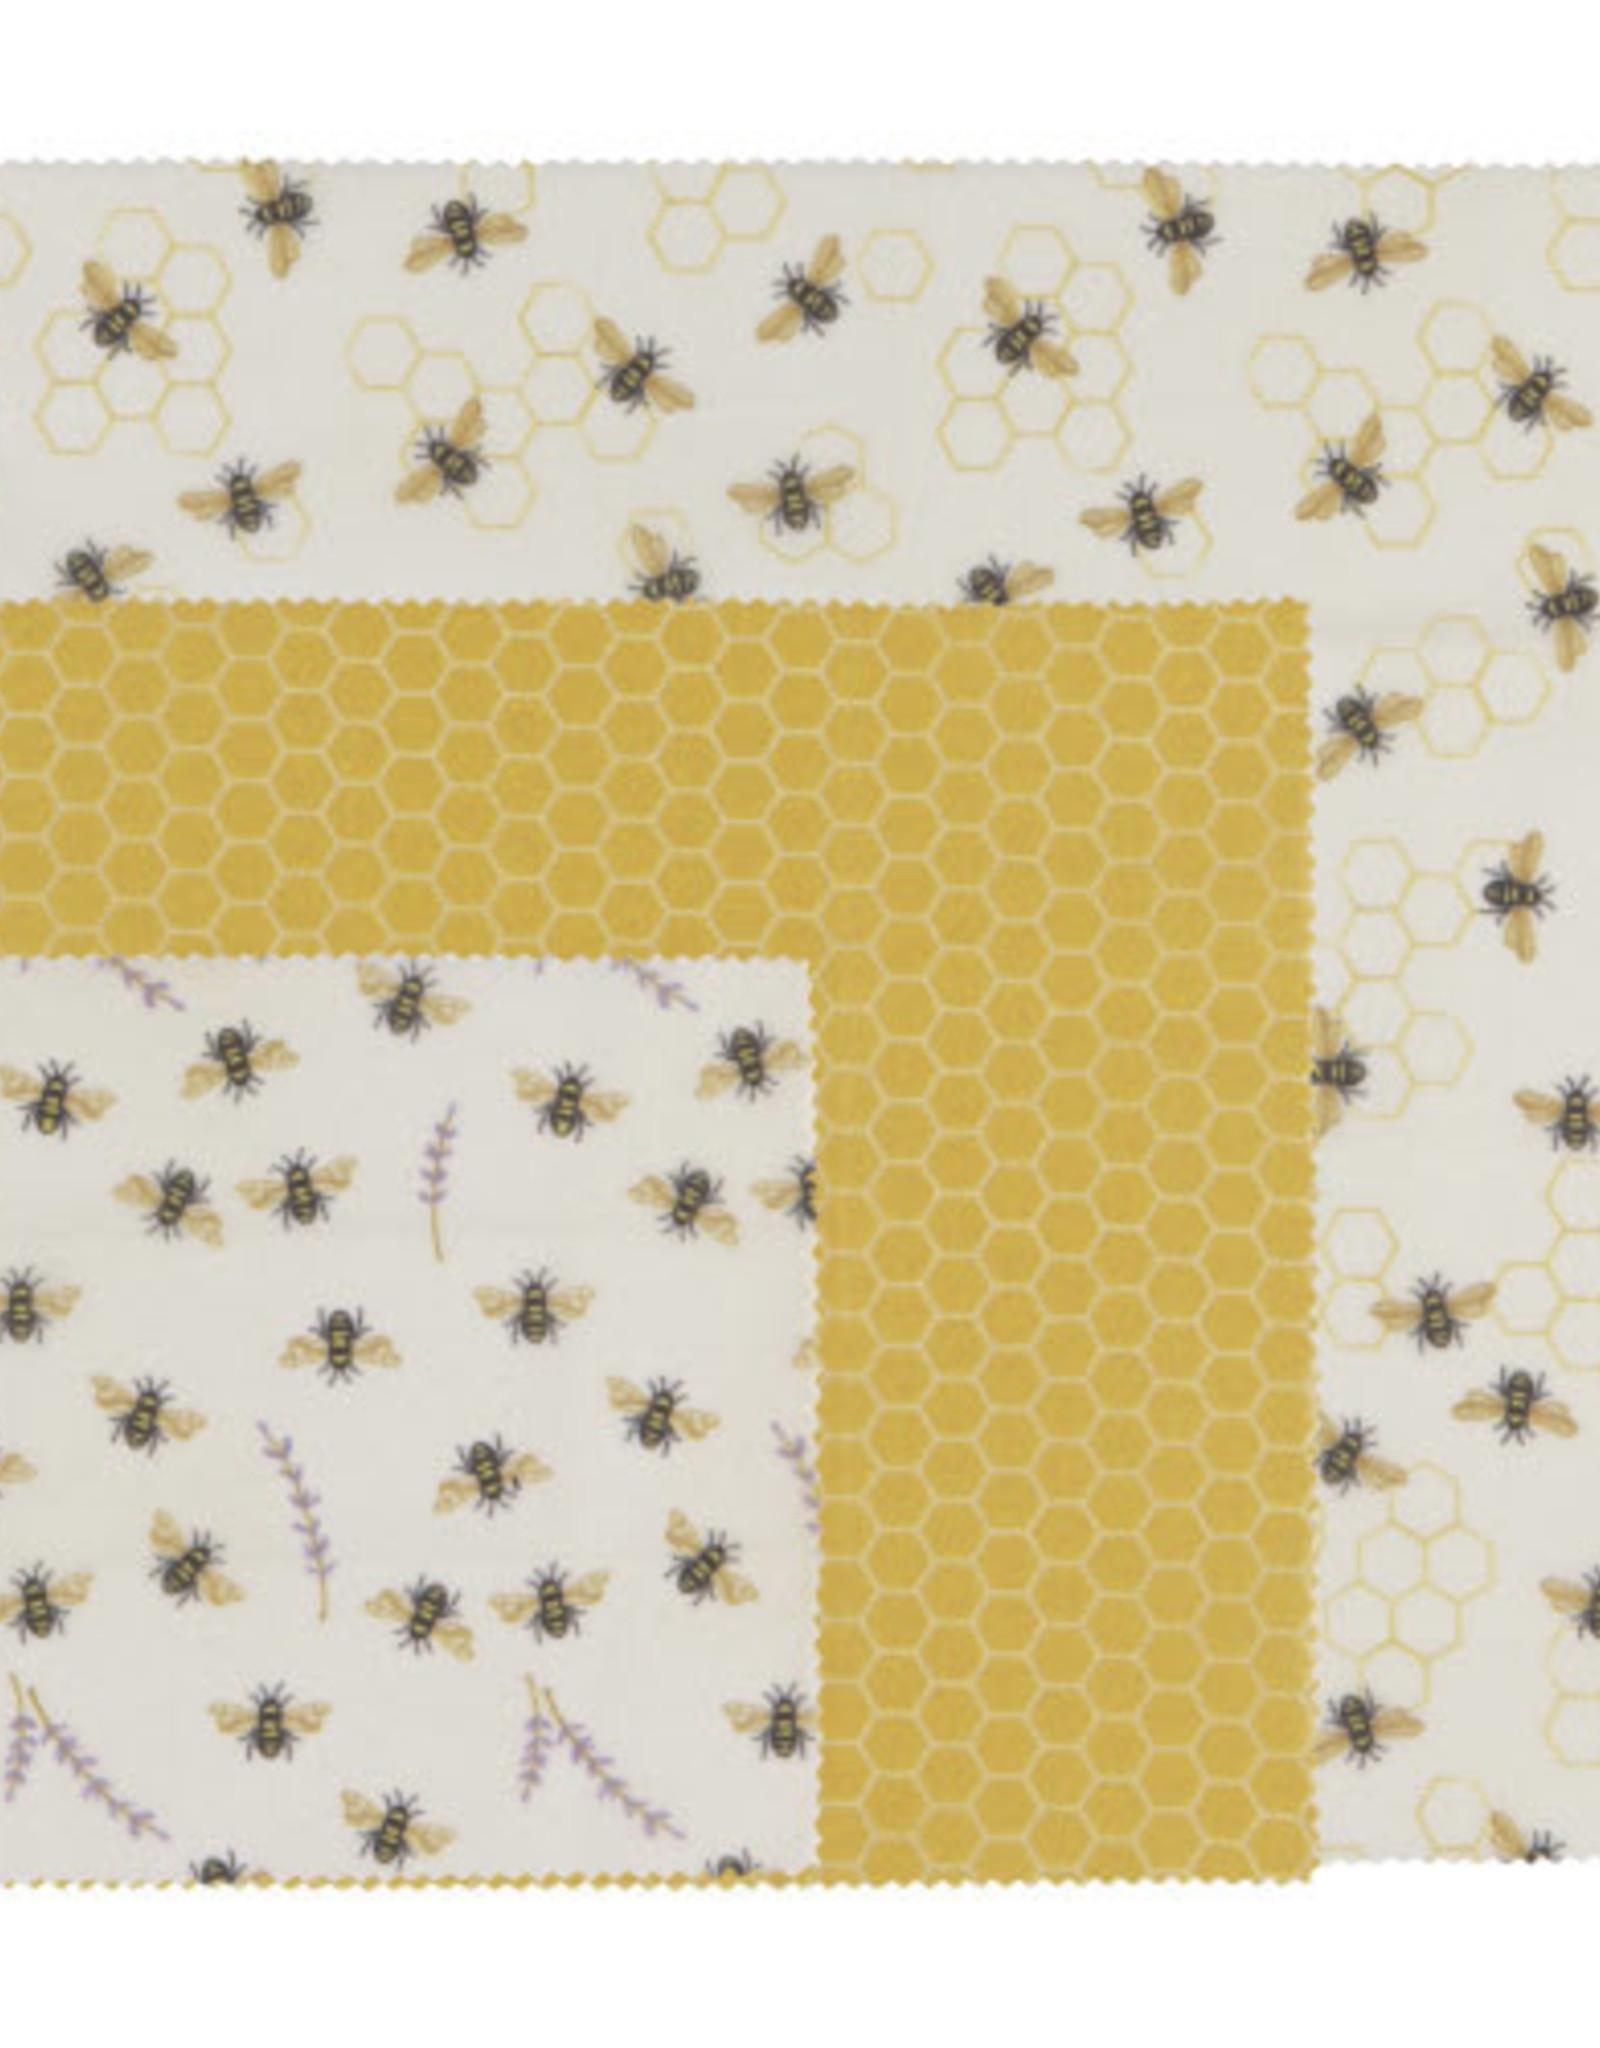 Danica Ecologie   Reusable Beeswax Wraps